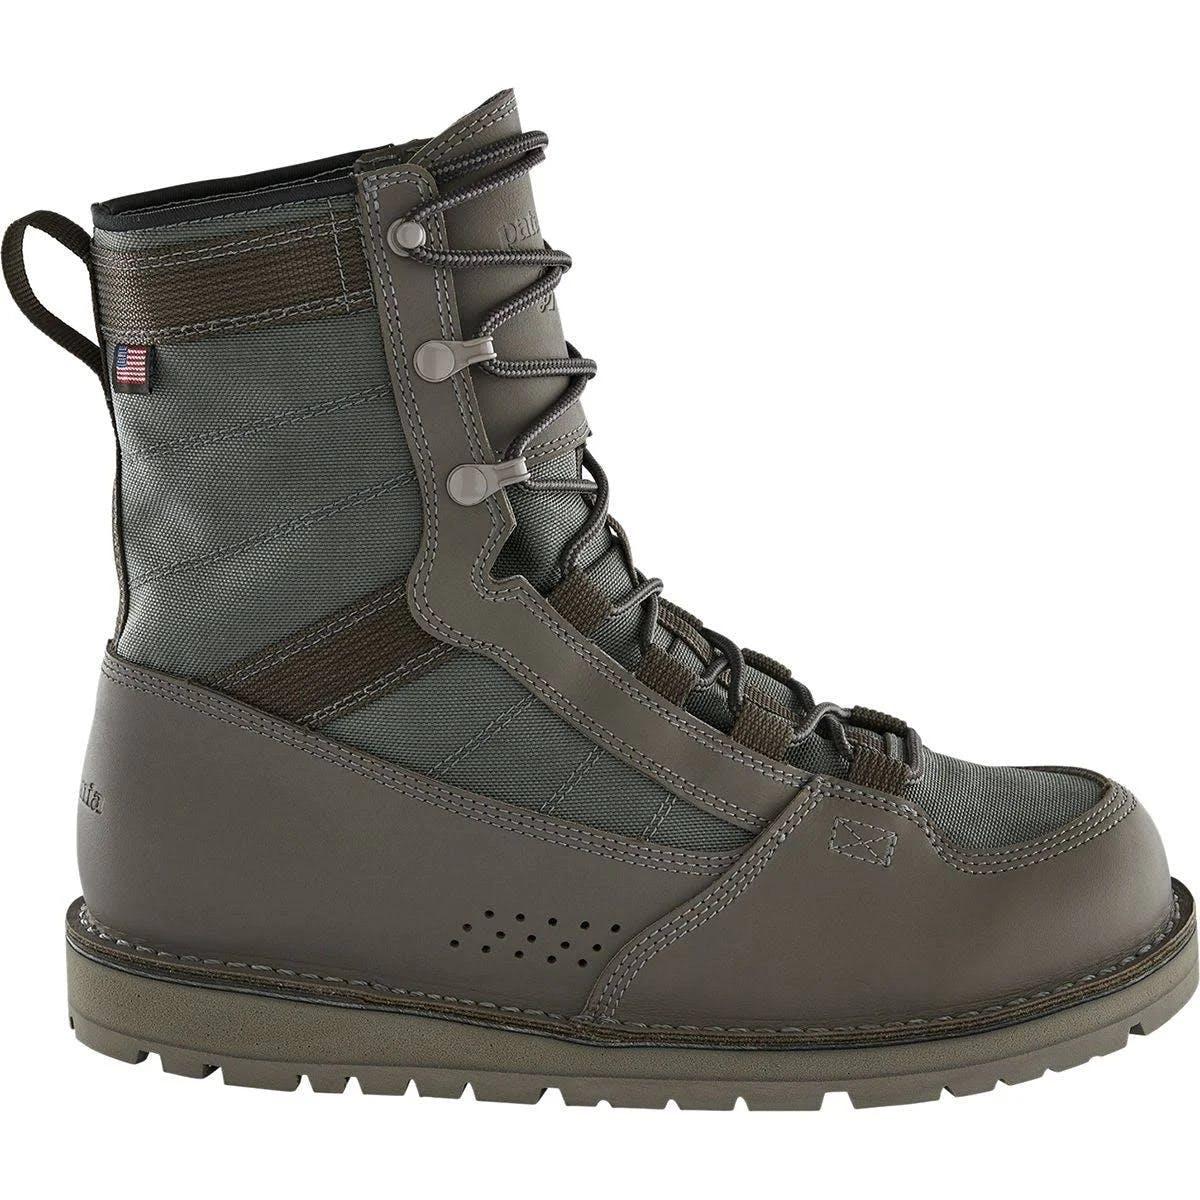 Patagonia / Danner River Salt Wading Boots - 13